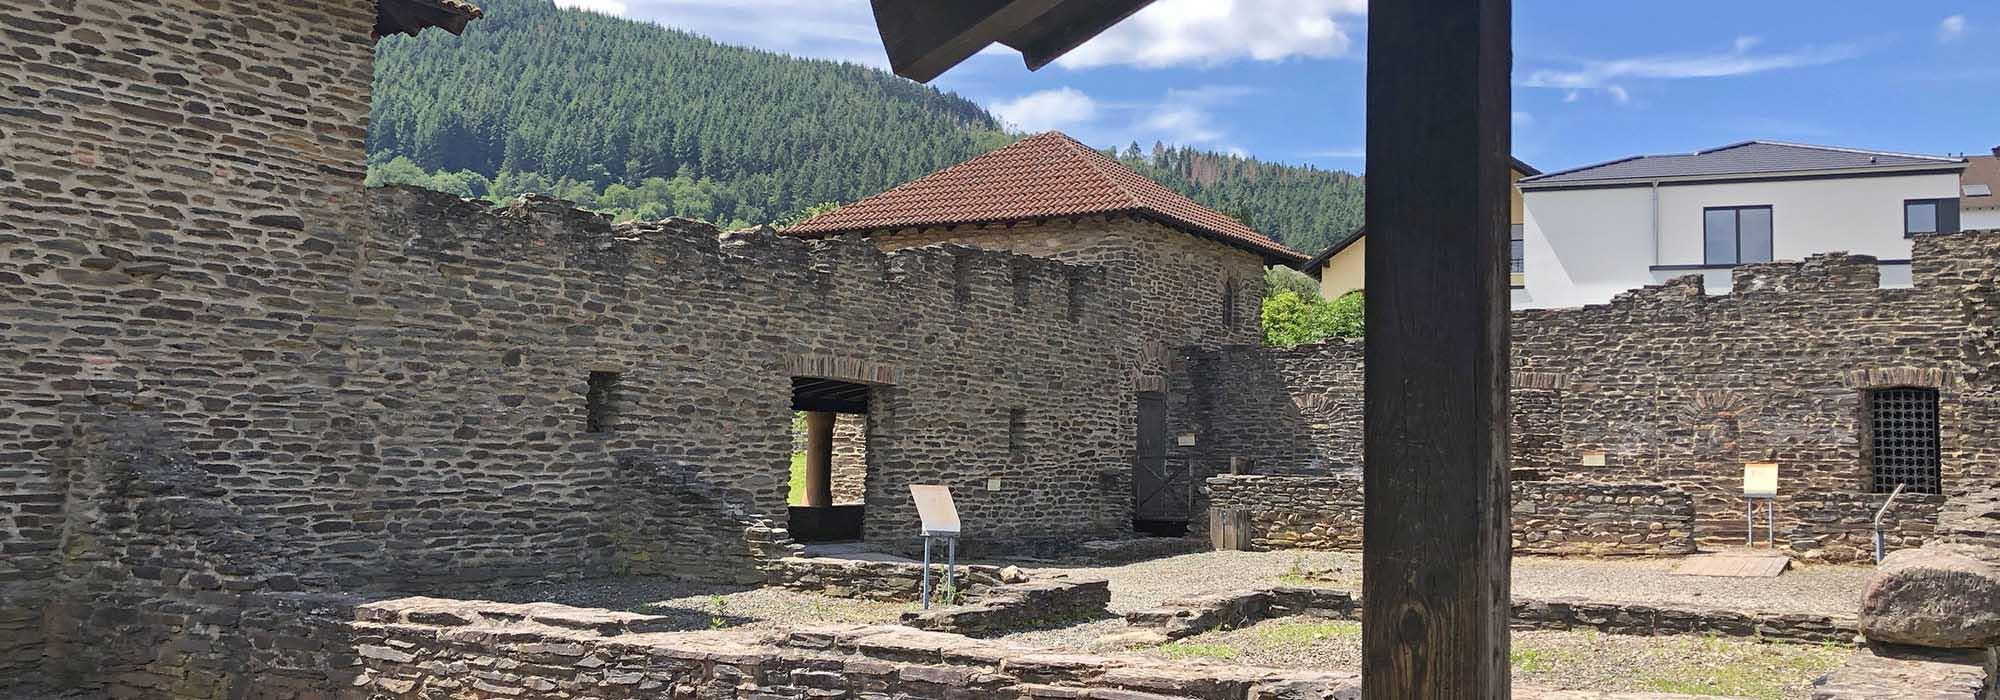 Villa-Rustica-IMG_8378